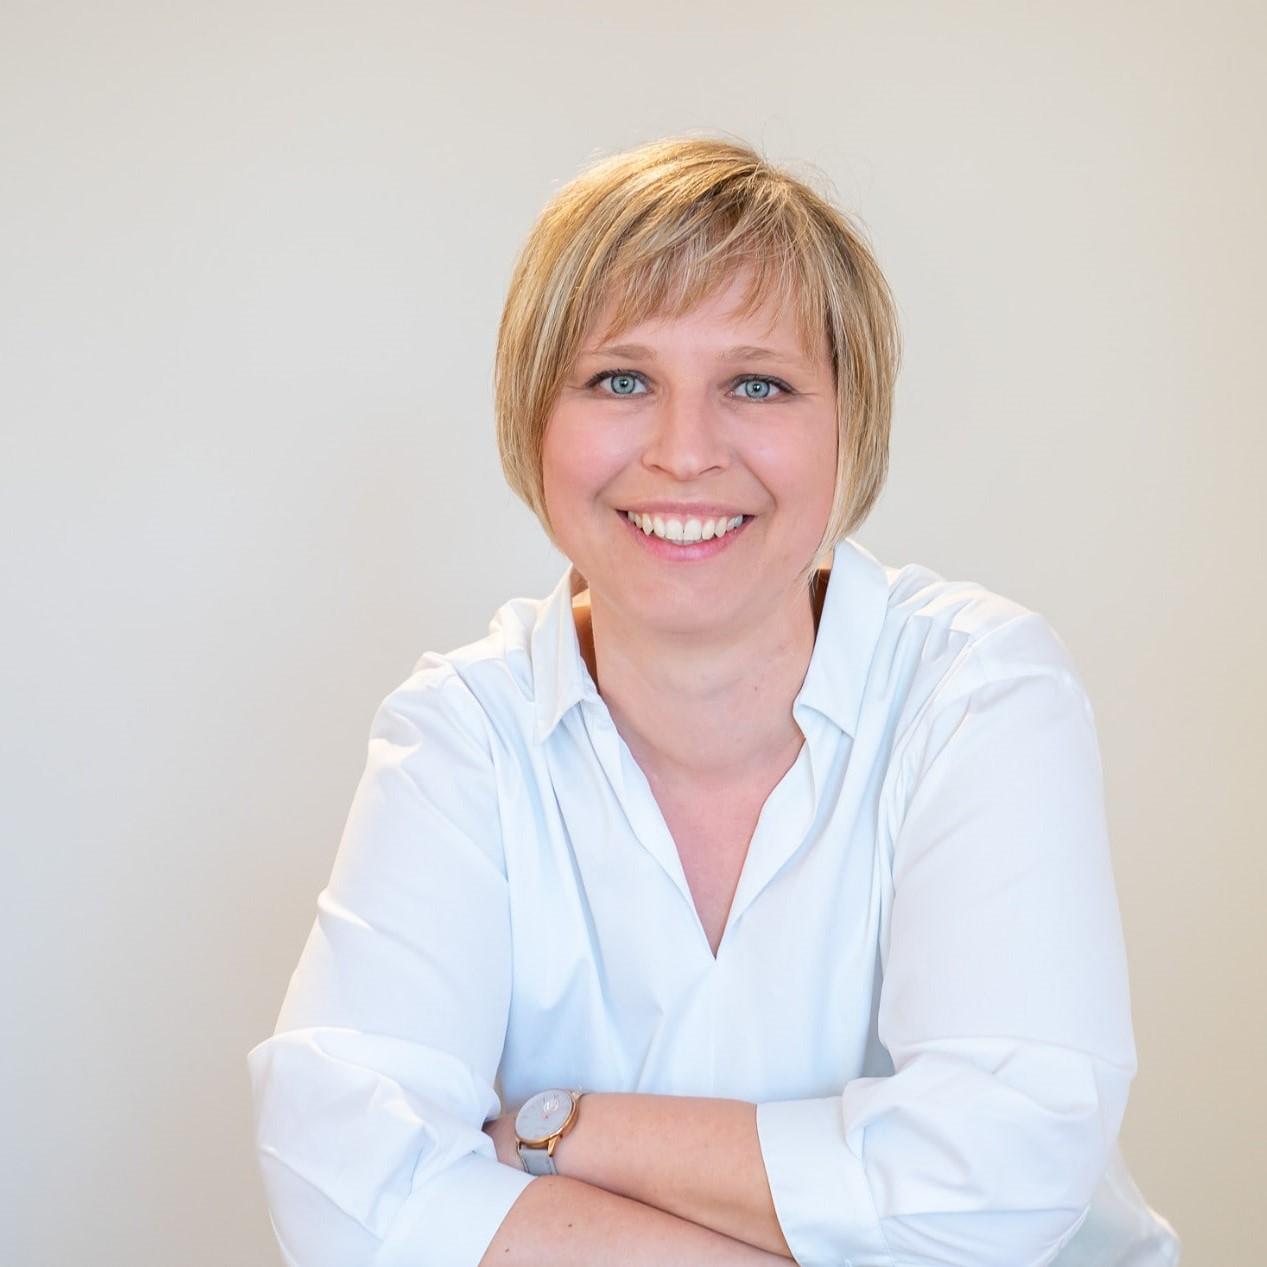 Portraitbild der Logopädin und Praxisinhaberin Carolin Huss